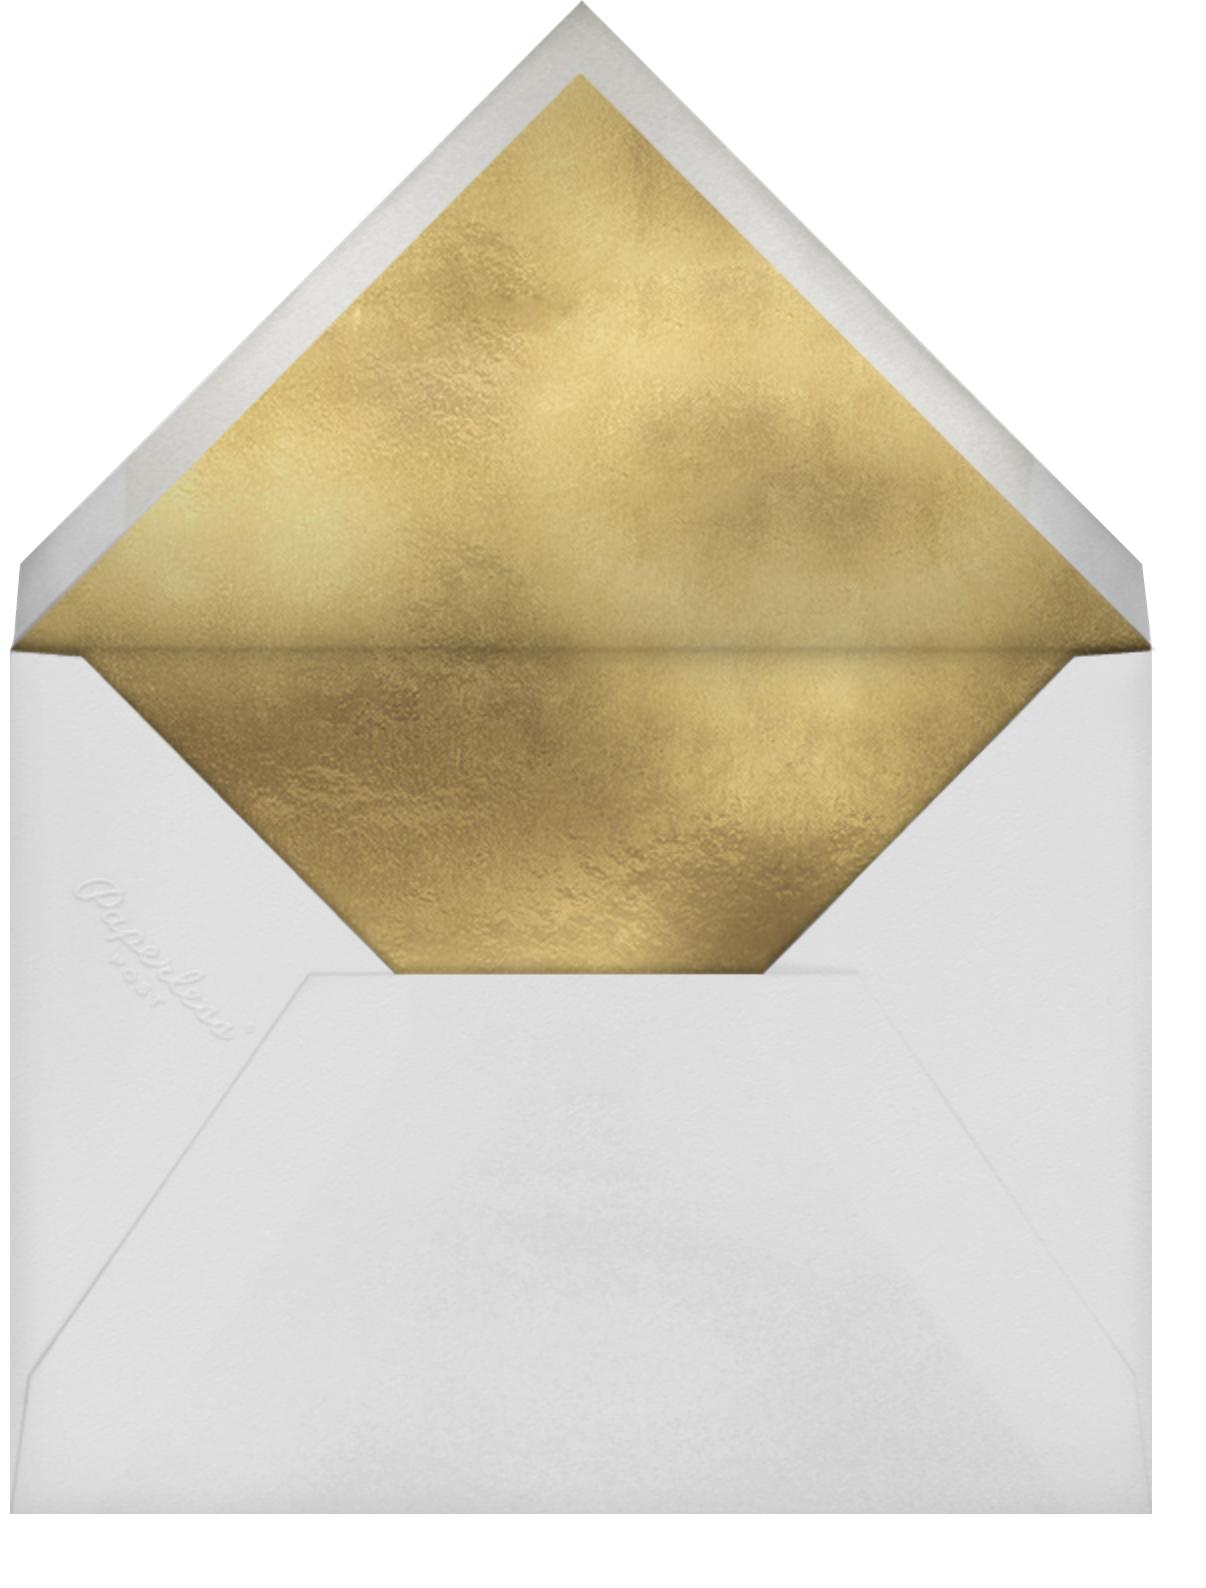 Striped Tulips - White - Oscar de la Renta - Baby shower - envelope back